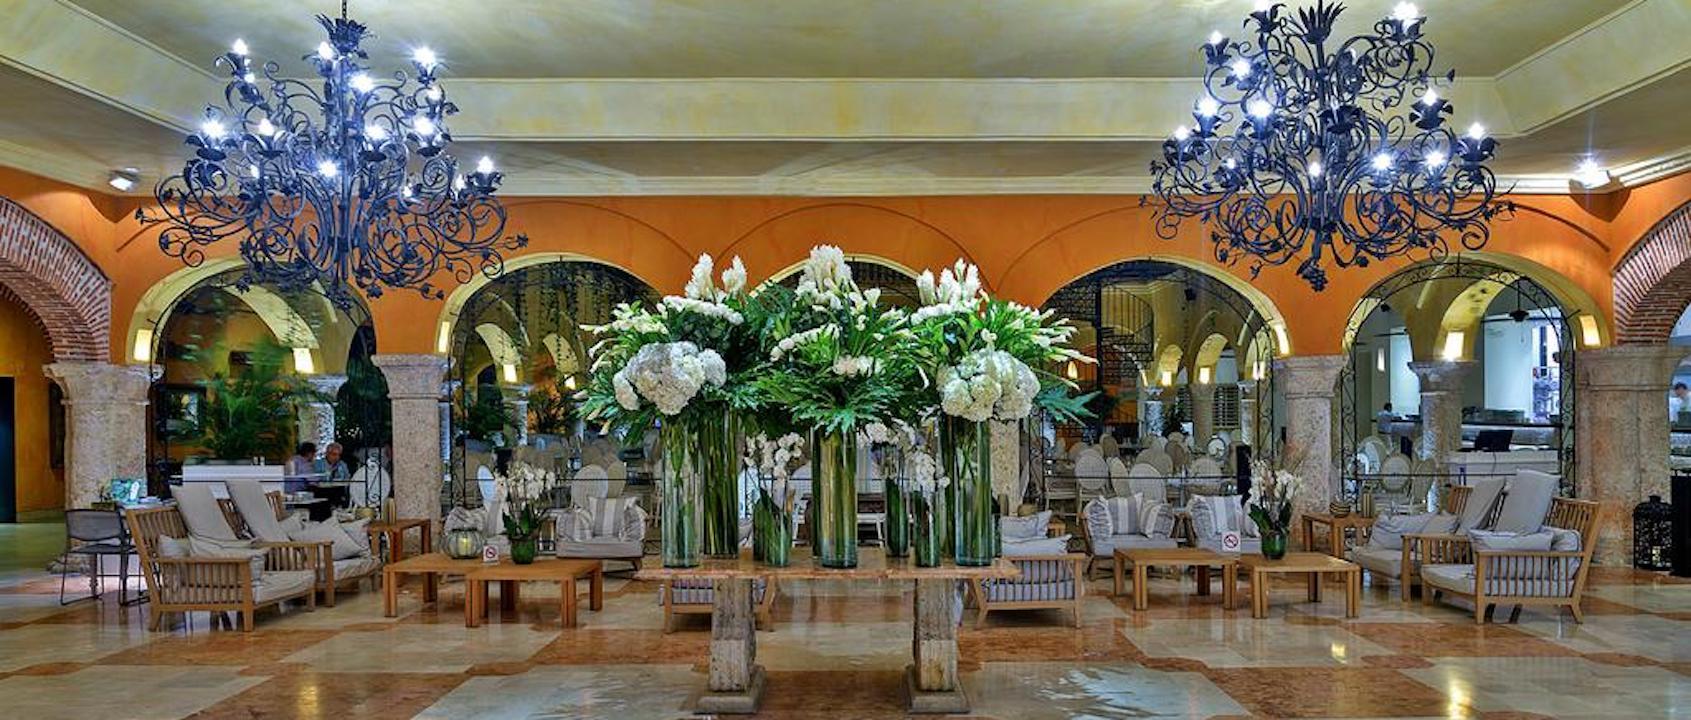 Hotel Charleston Santa Teresa , Cartagena / Colombia